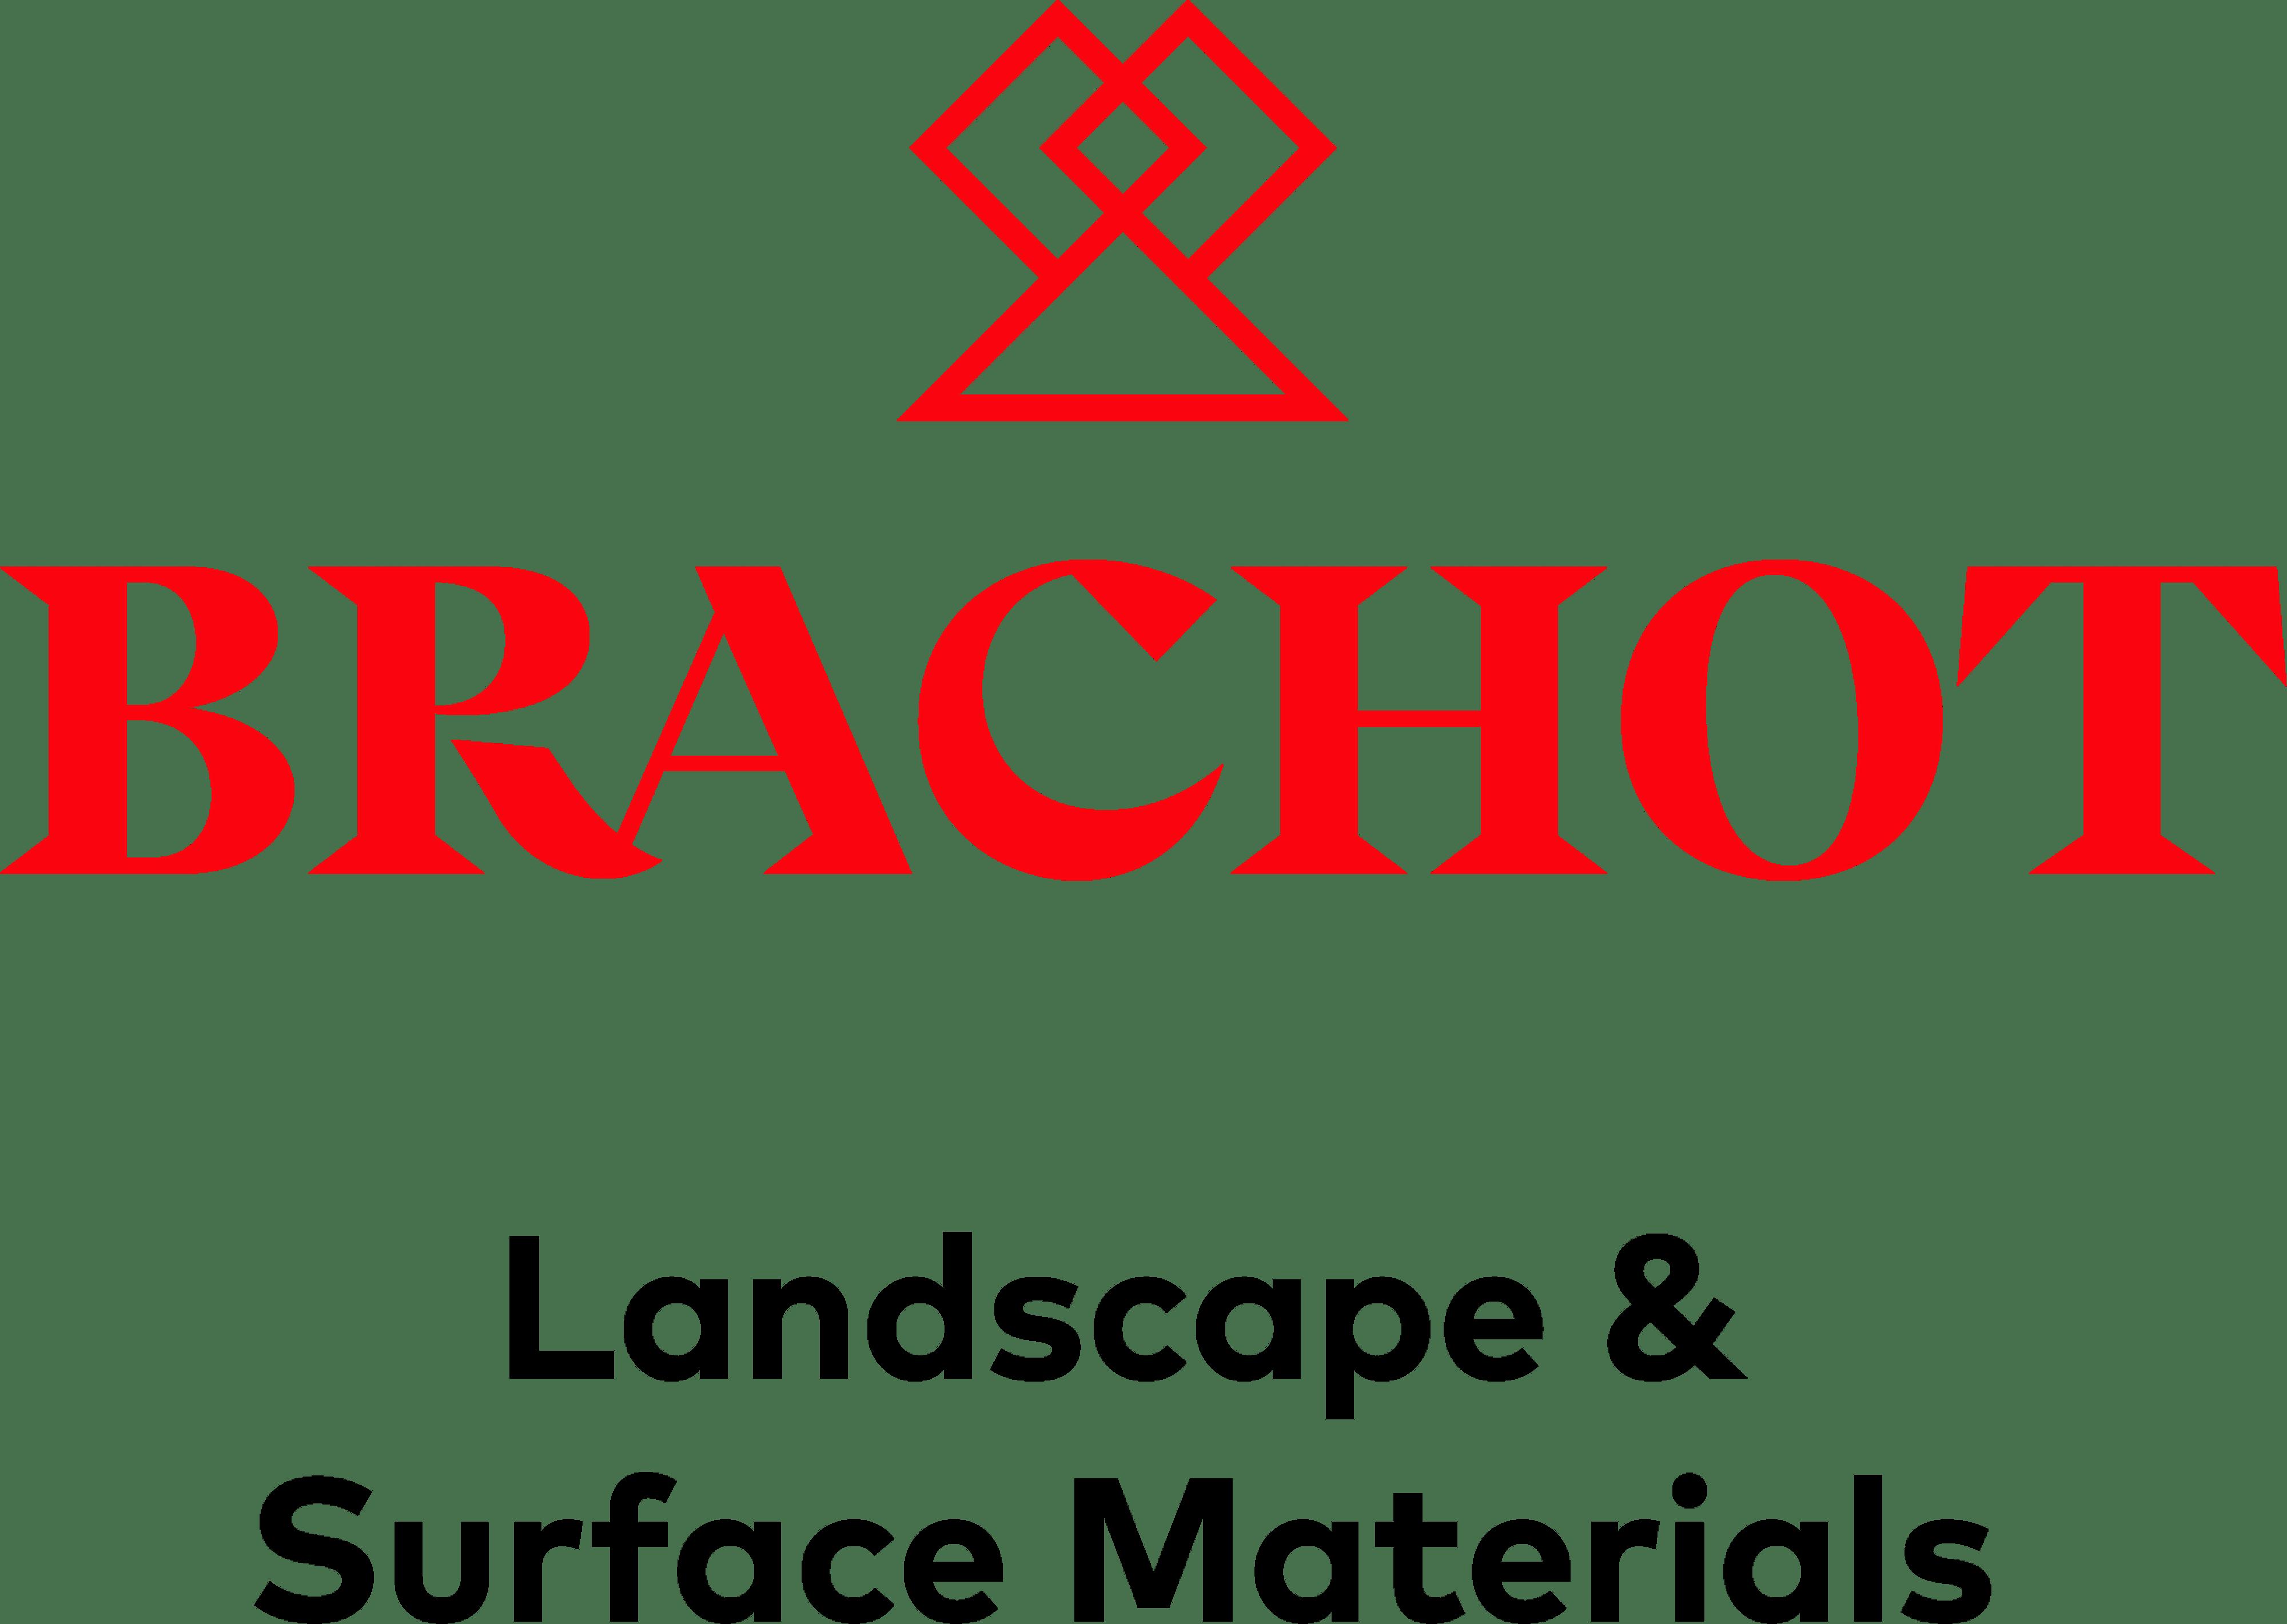 Brachot logo